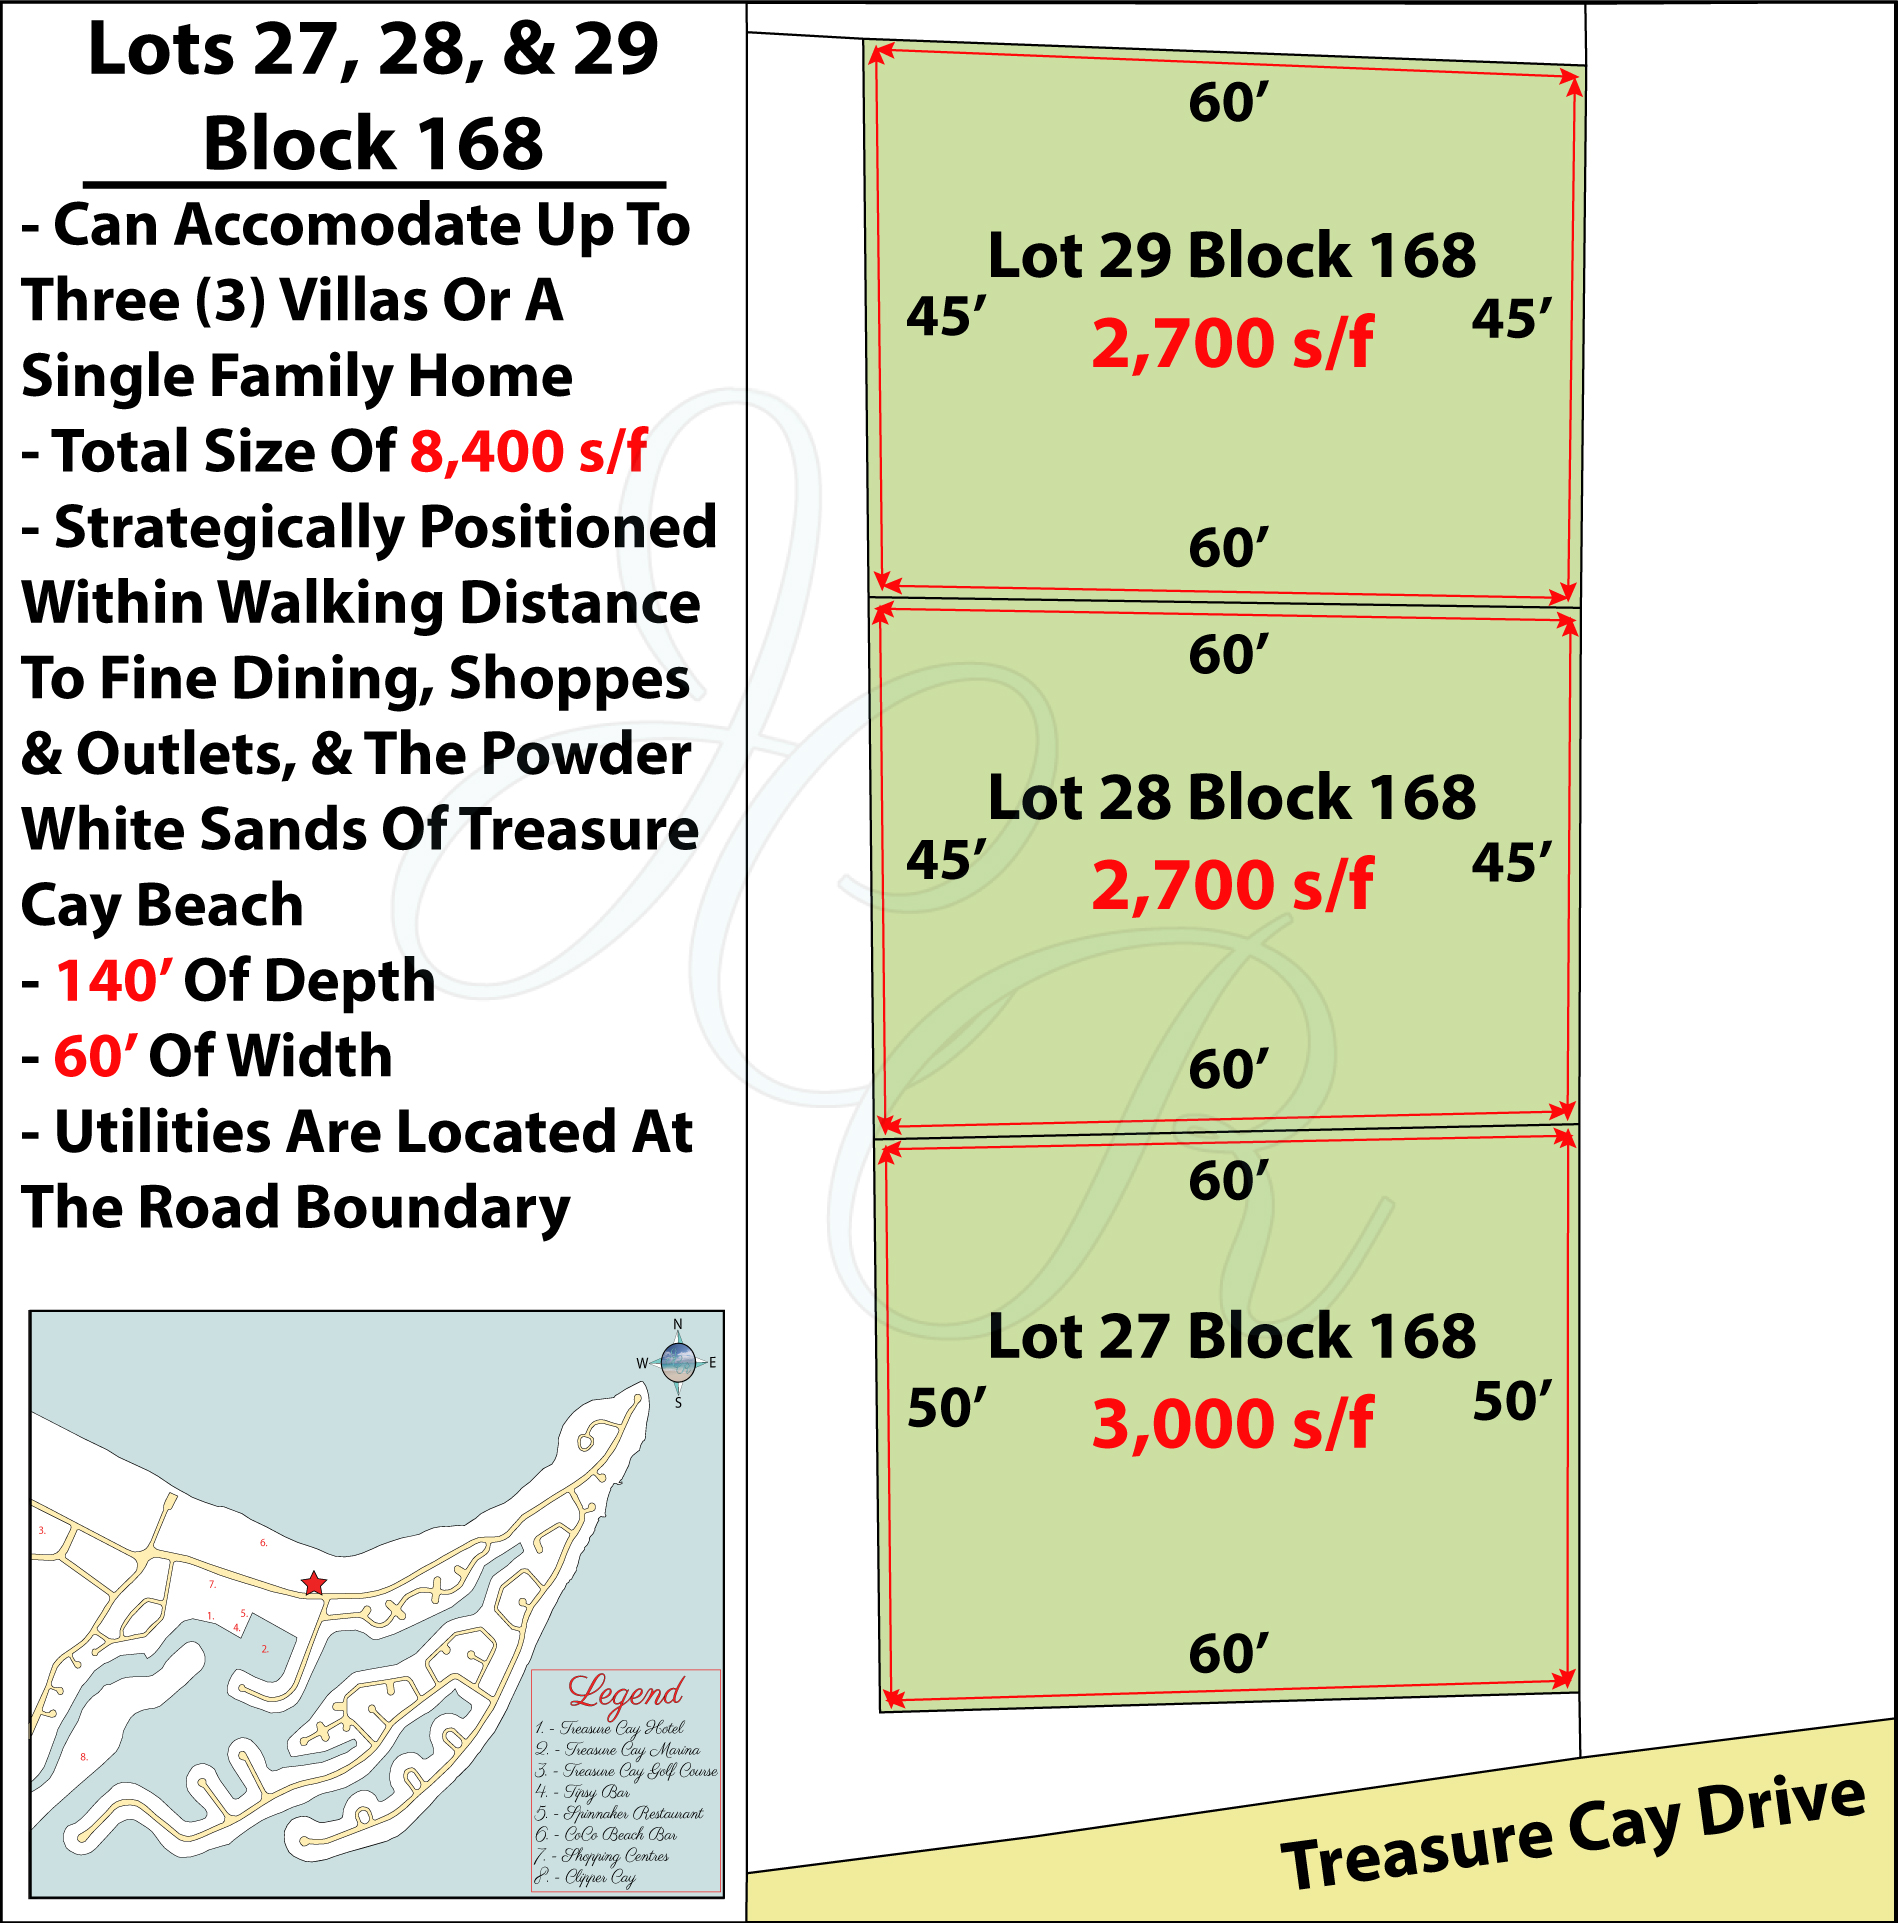 Lots 27, 28, & 29 Block 168 Plot Plan John Cash Realty